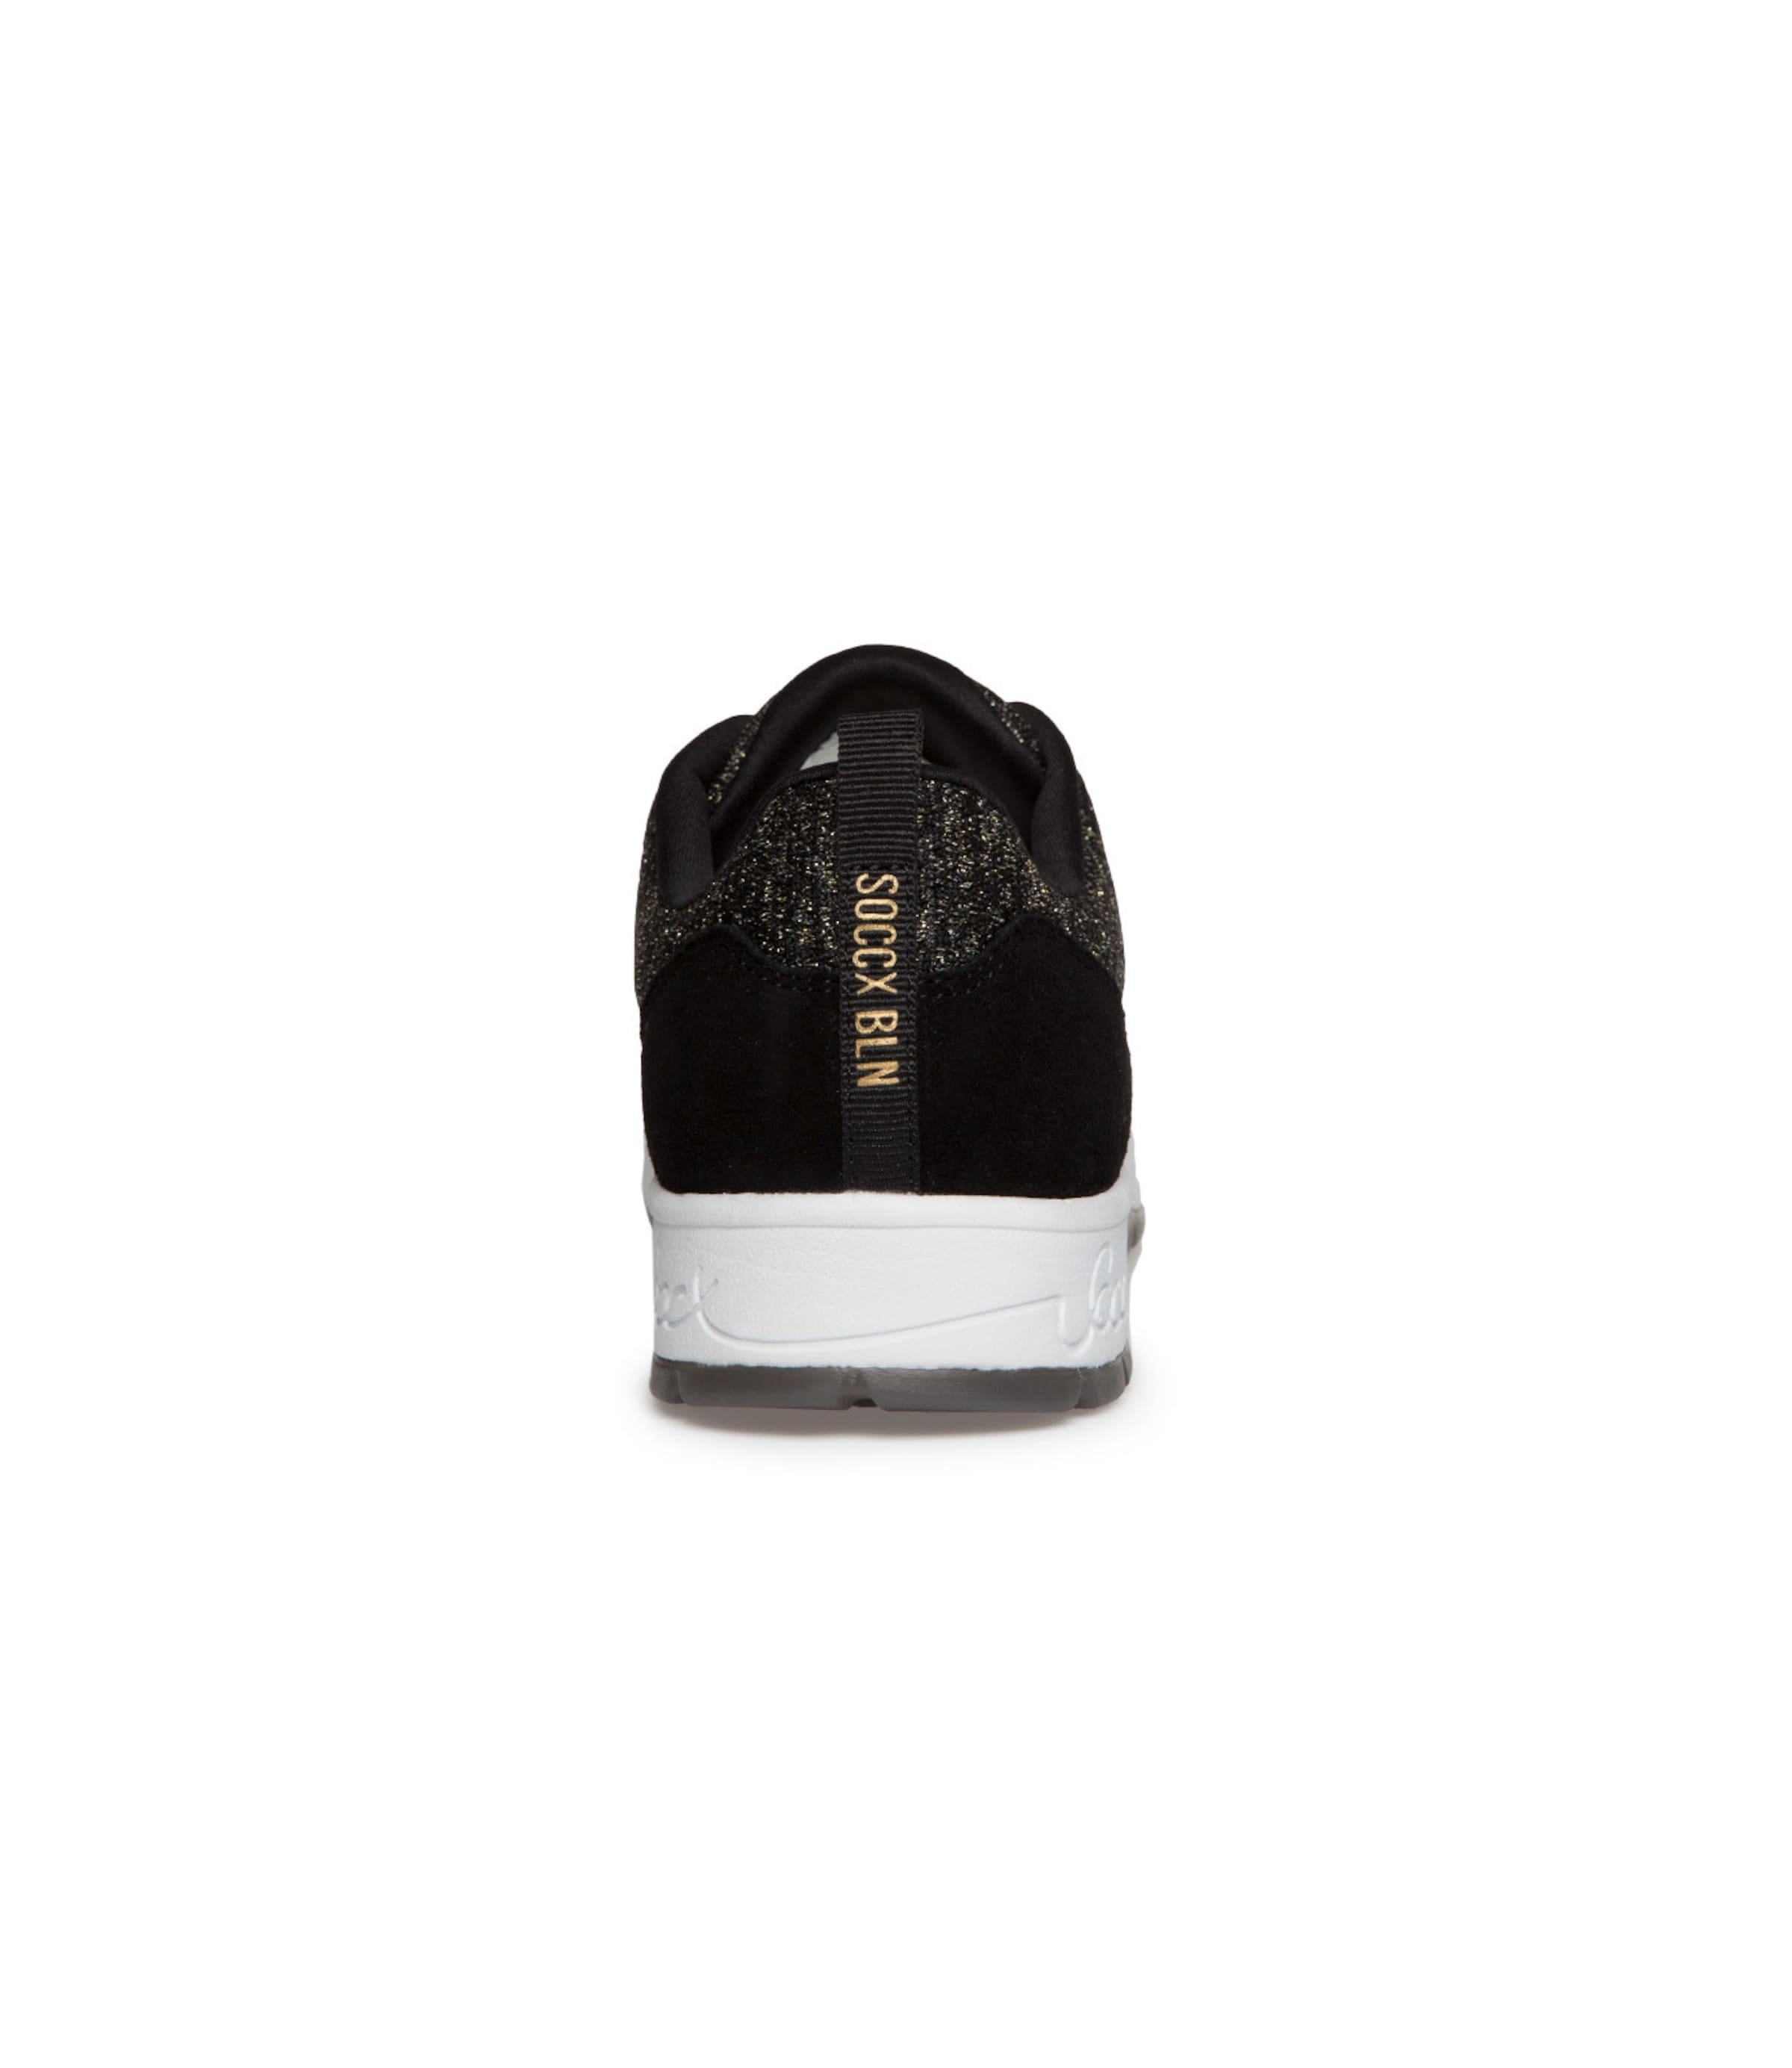 GoldSchwarz Weiß In Soccx Sneaker Sneaker Soccx 8yOPmNwv0n